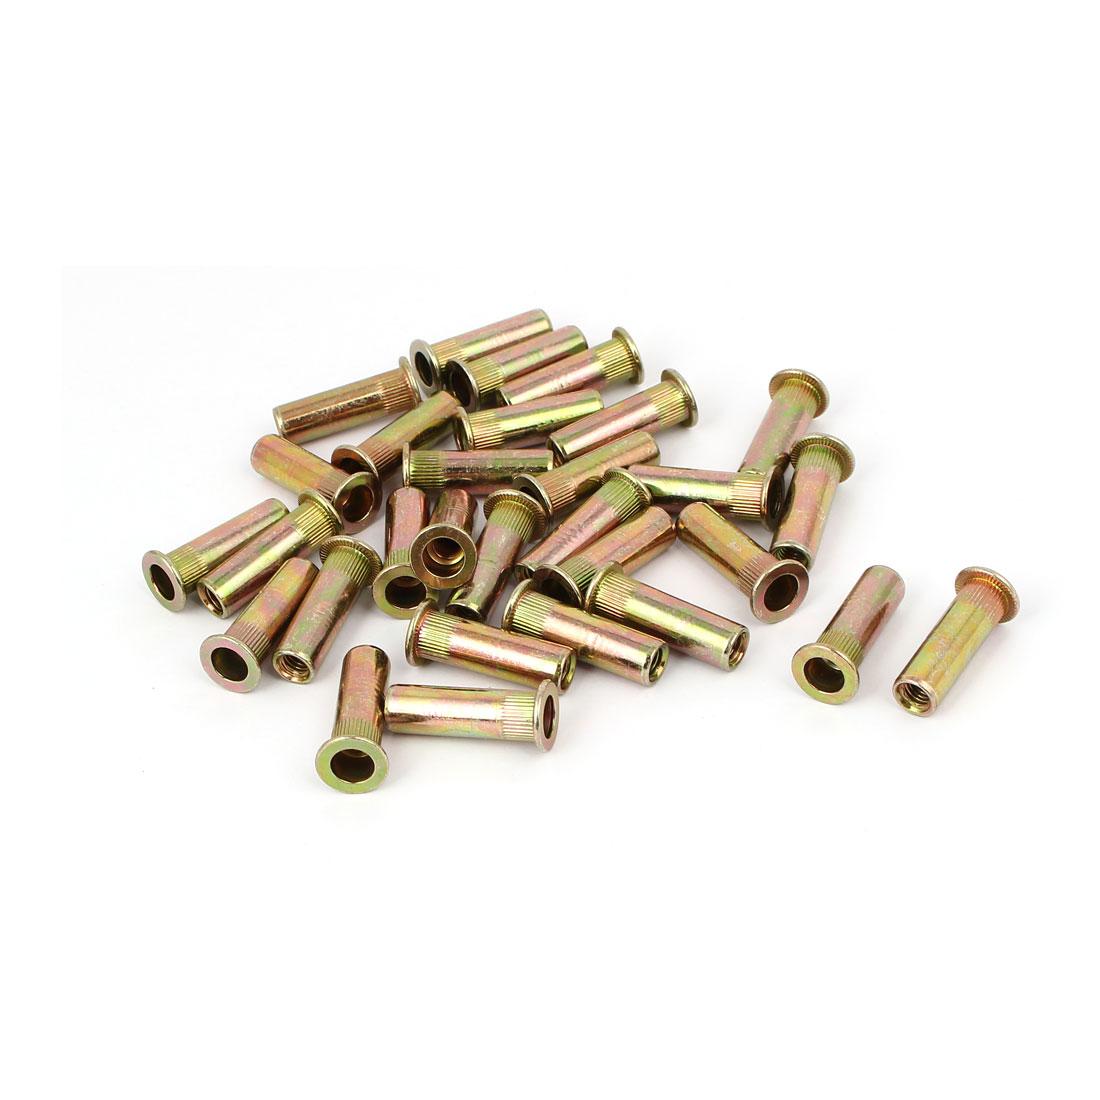 M6 x 30mm Knurled Blind Rivet Nut Open End Embedded Insert Nutsert 30PCS